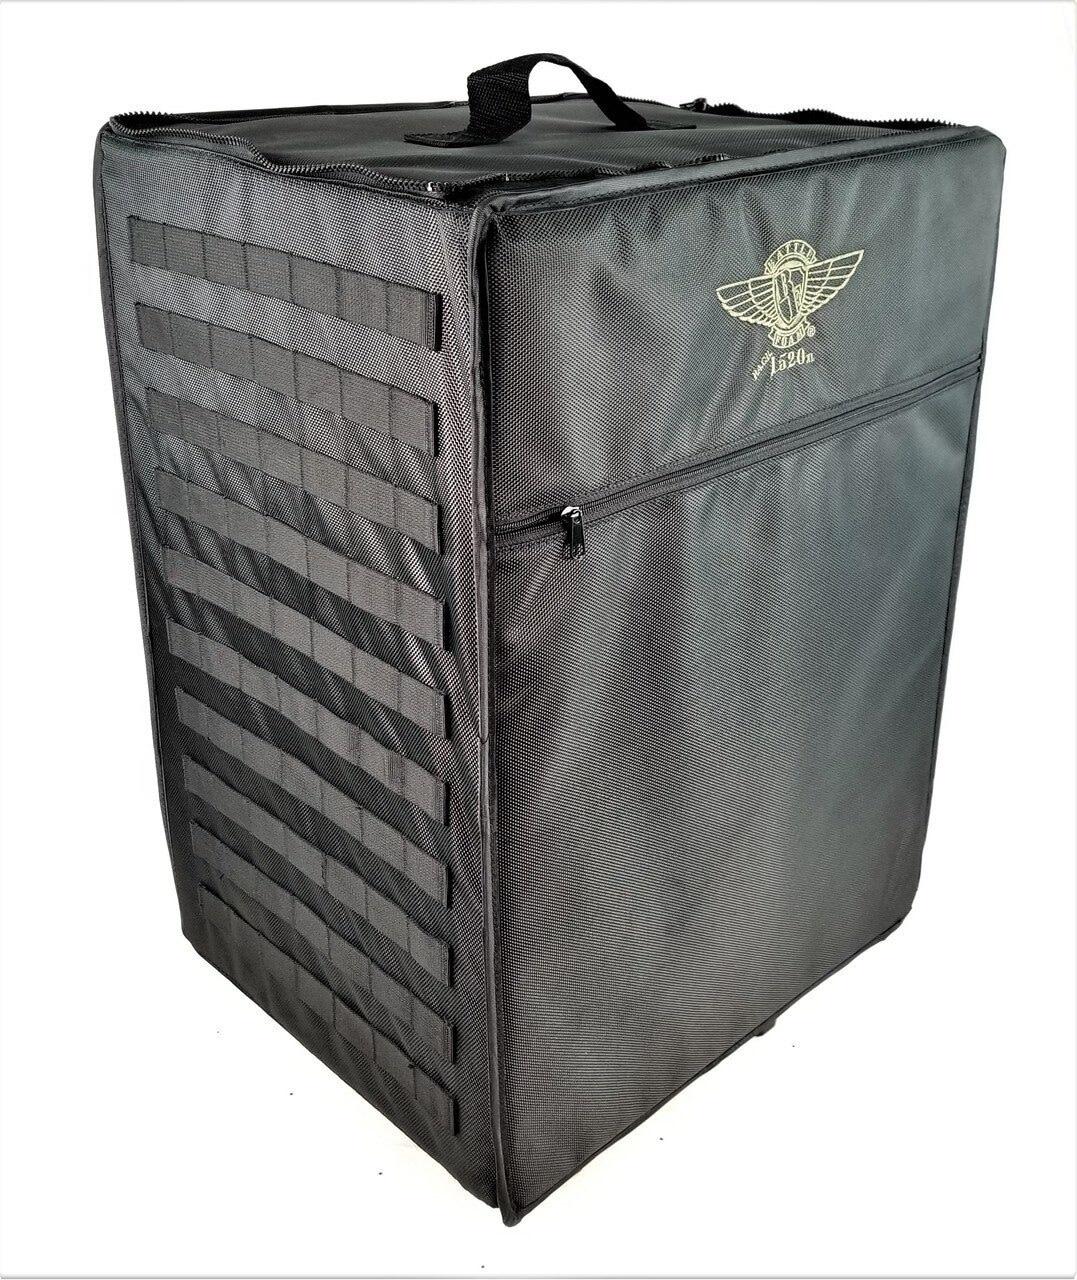 Battle Foam Bags Universal P A C K 1520xl Molle Standard Load Out Black Discount Games Inc Get the latest battlefoam hobbies at mighty ape australia. discount games inc